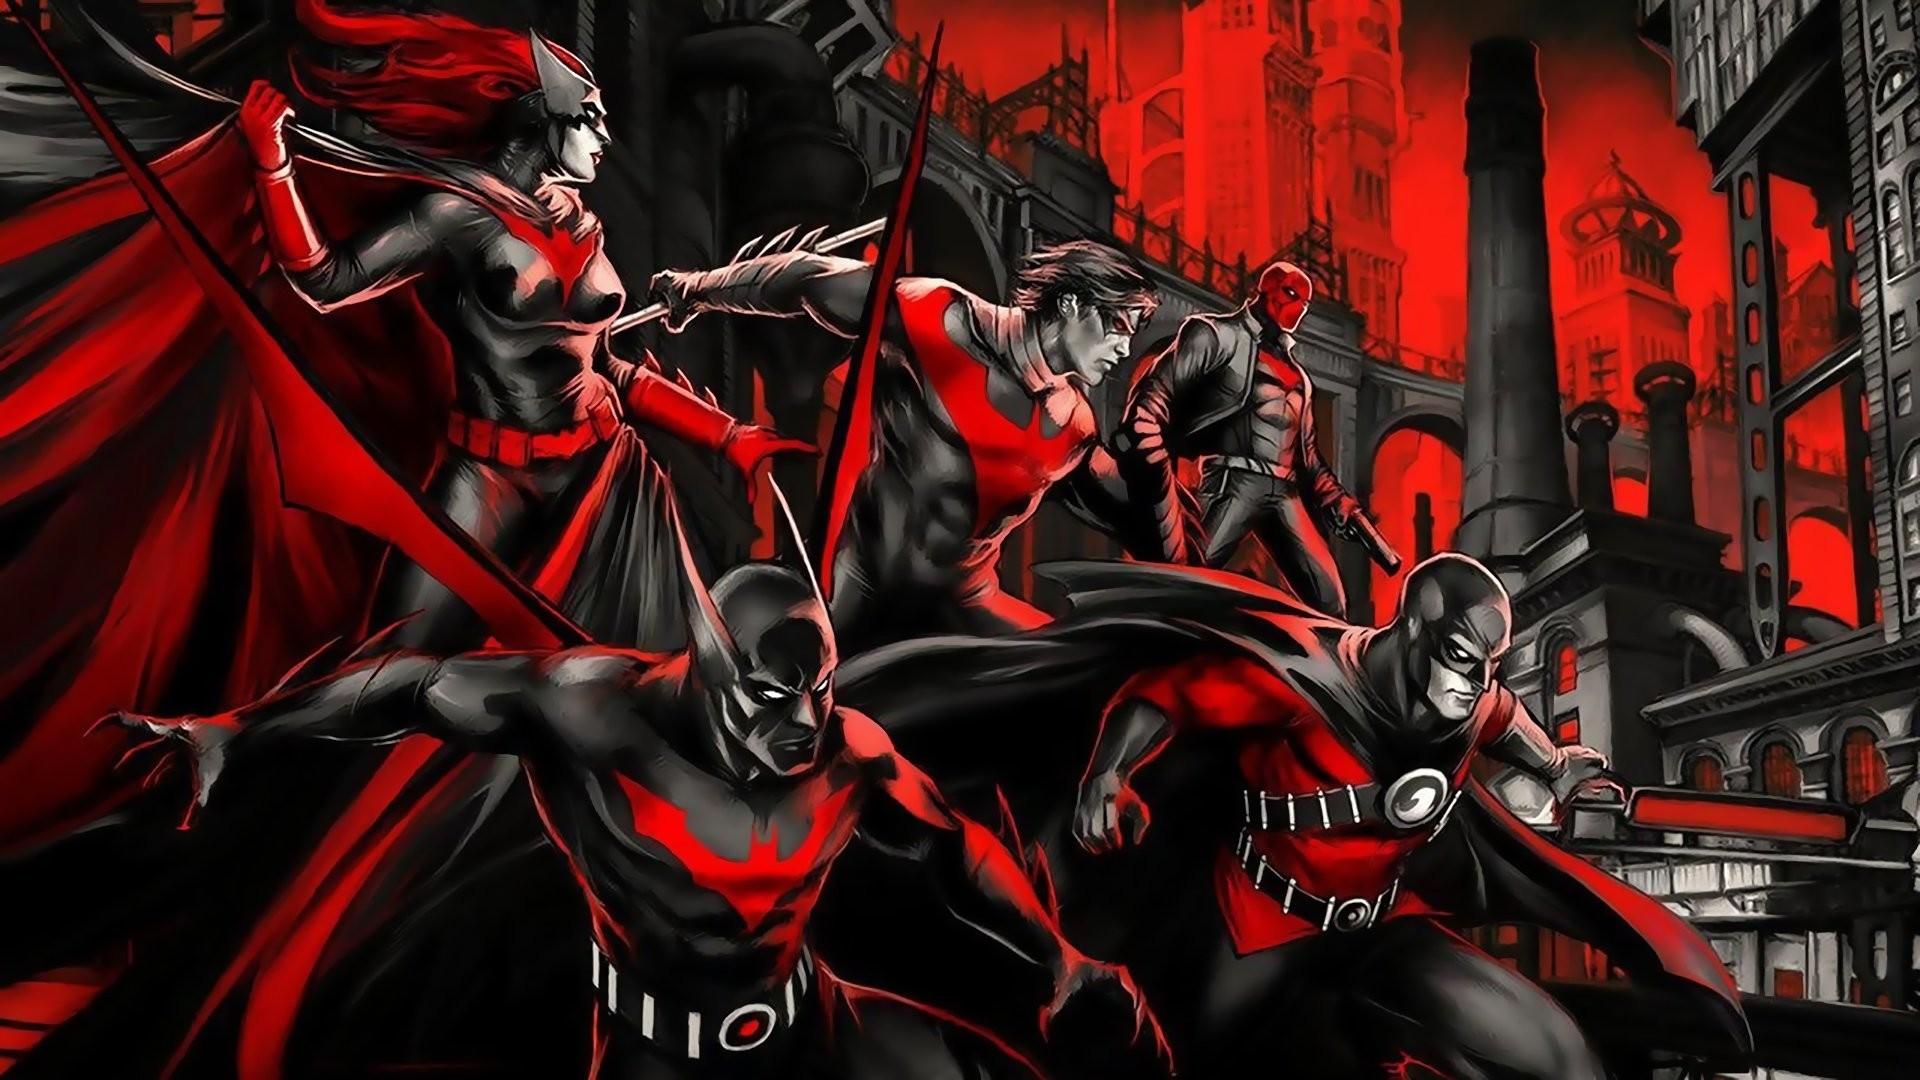 batman beyond batwoman red robin nightwing red hood gotham red dc comics batman  beyond betvumen red